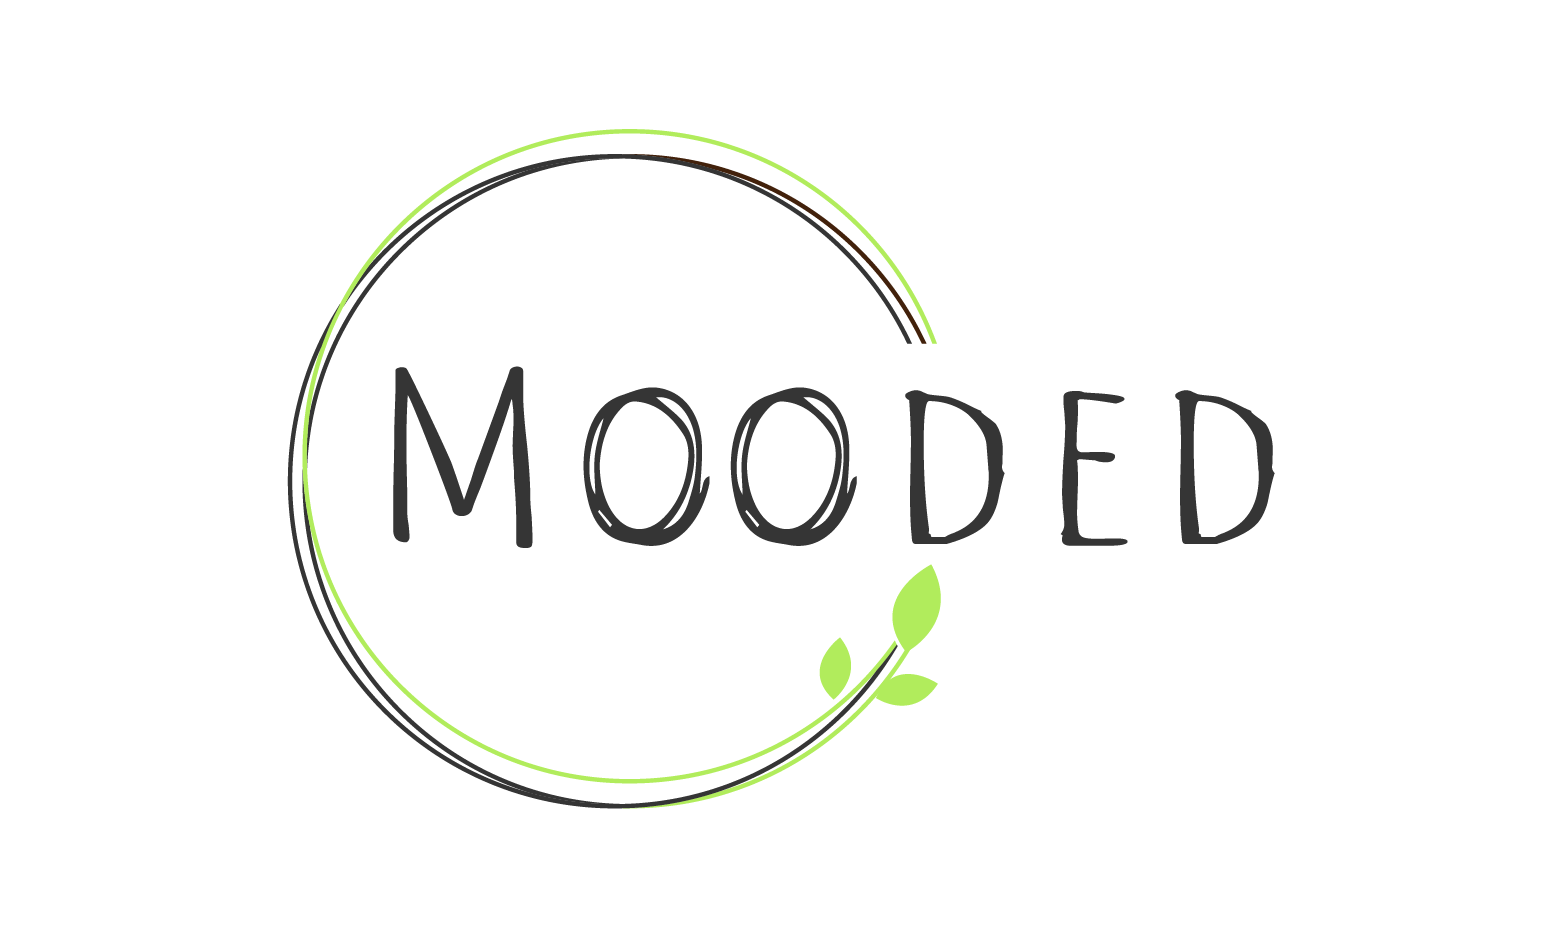 Mooded.com